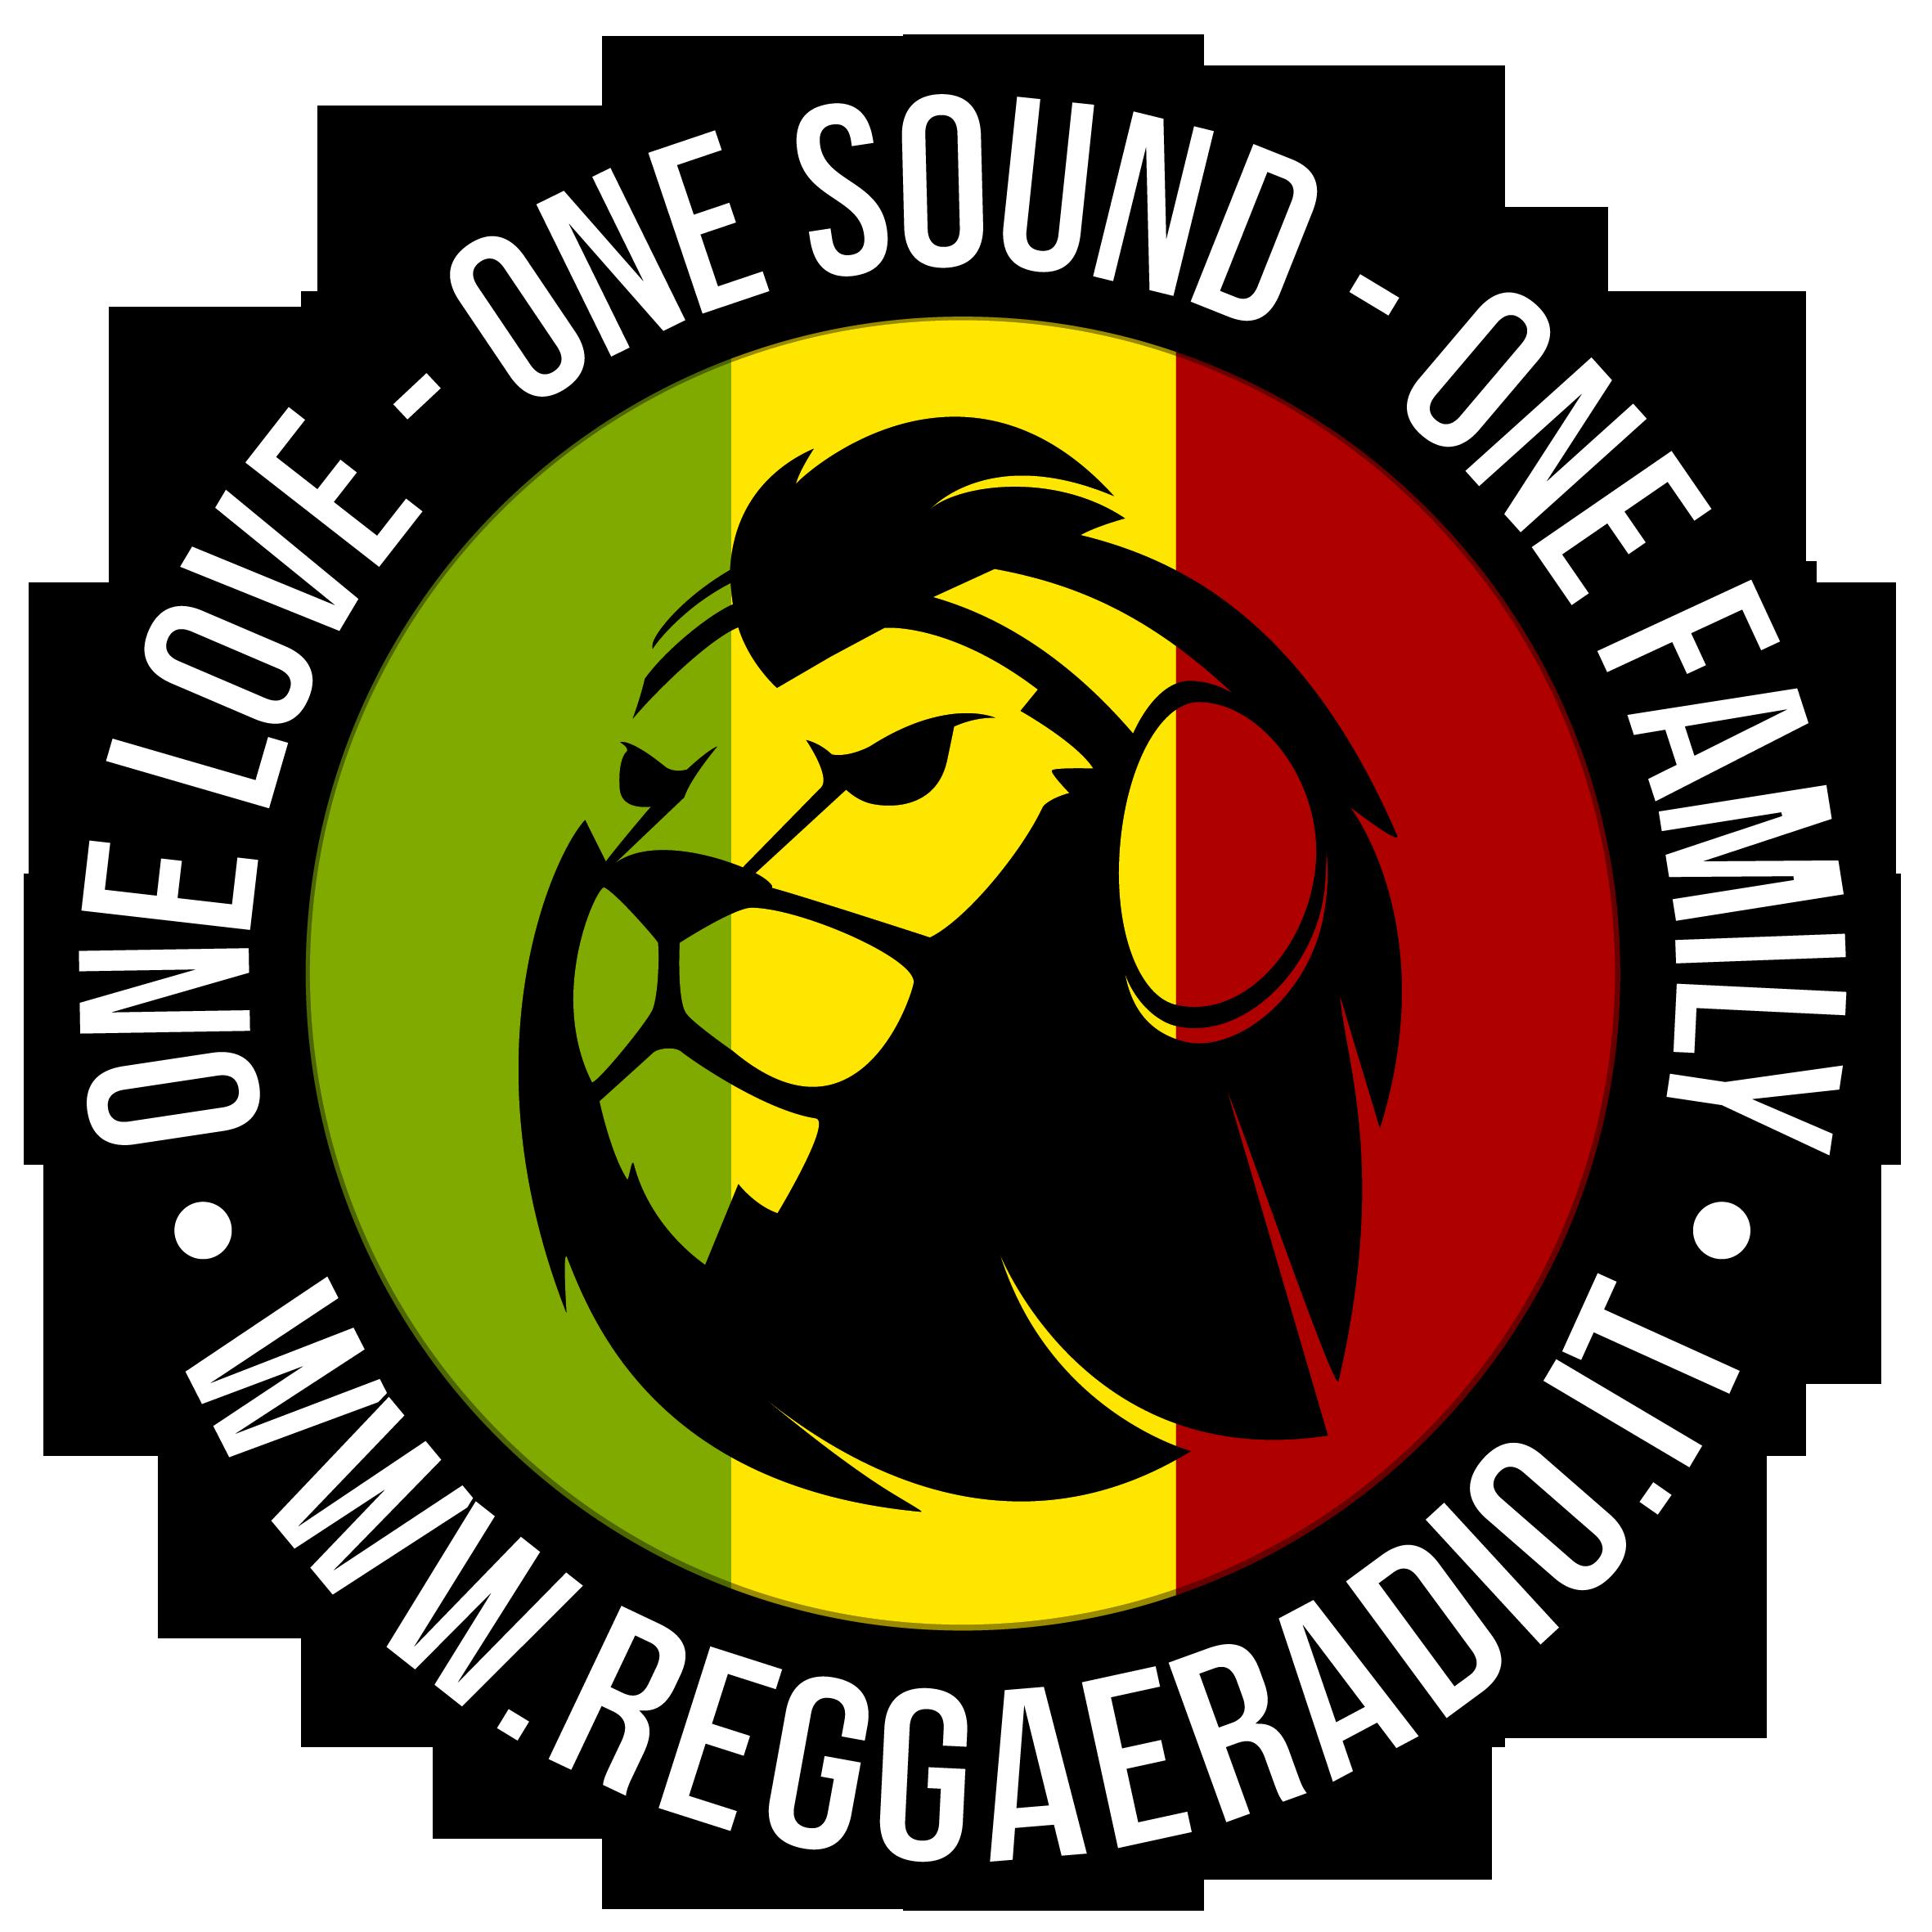 Logo Reggaeradio.it